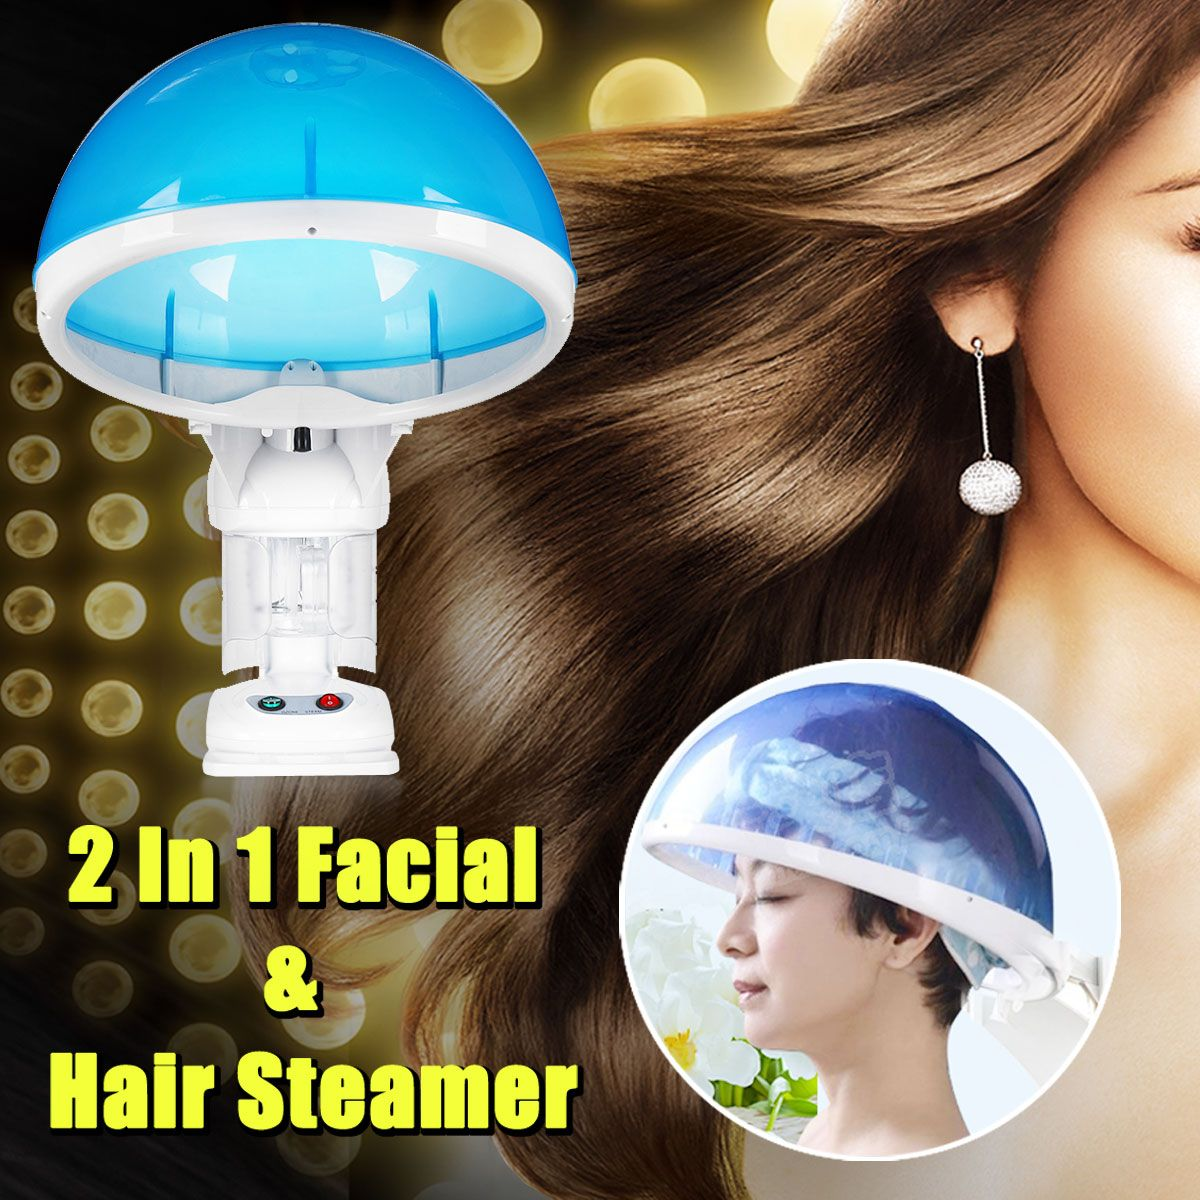 Facial & Hair Steamer 2 in 1 Table Hot Steam Fog Top Ozone Aroma Hair Moisture Salon 110V/220V Temperature Controller Absorption